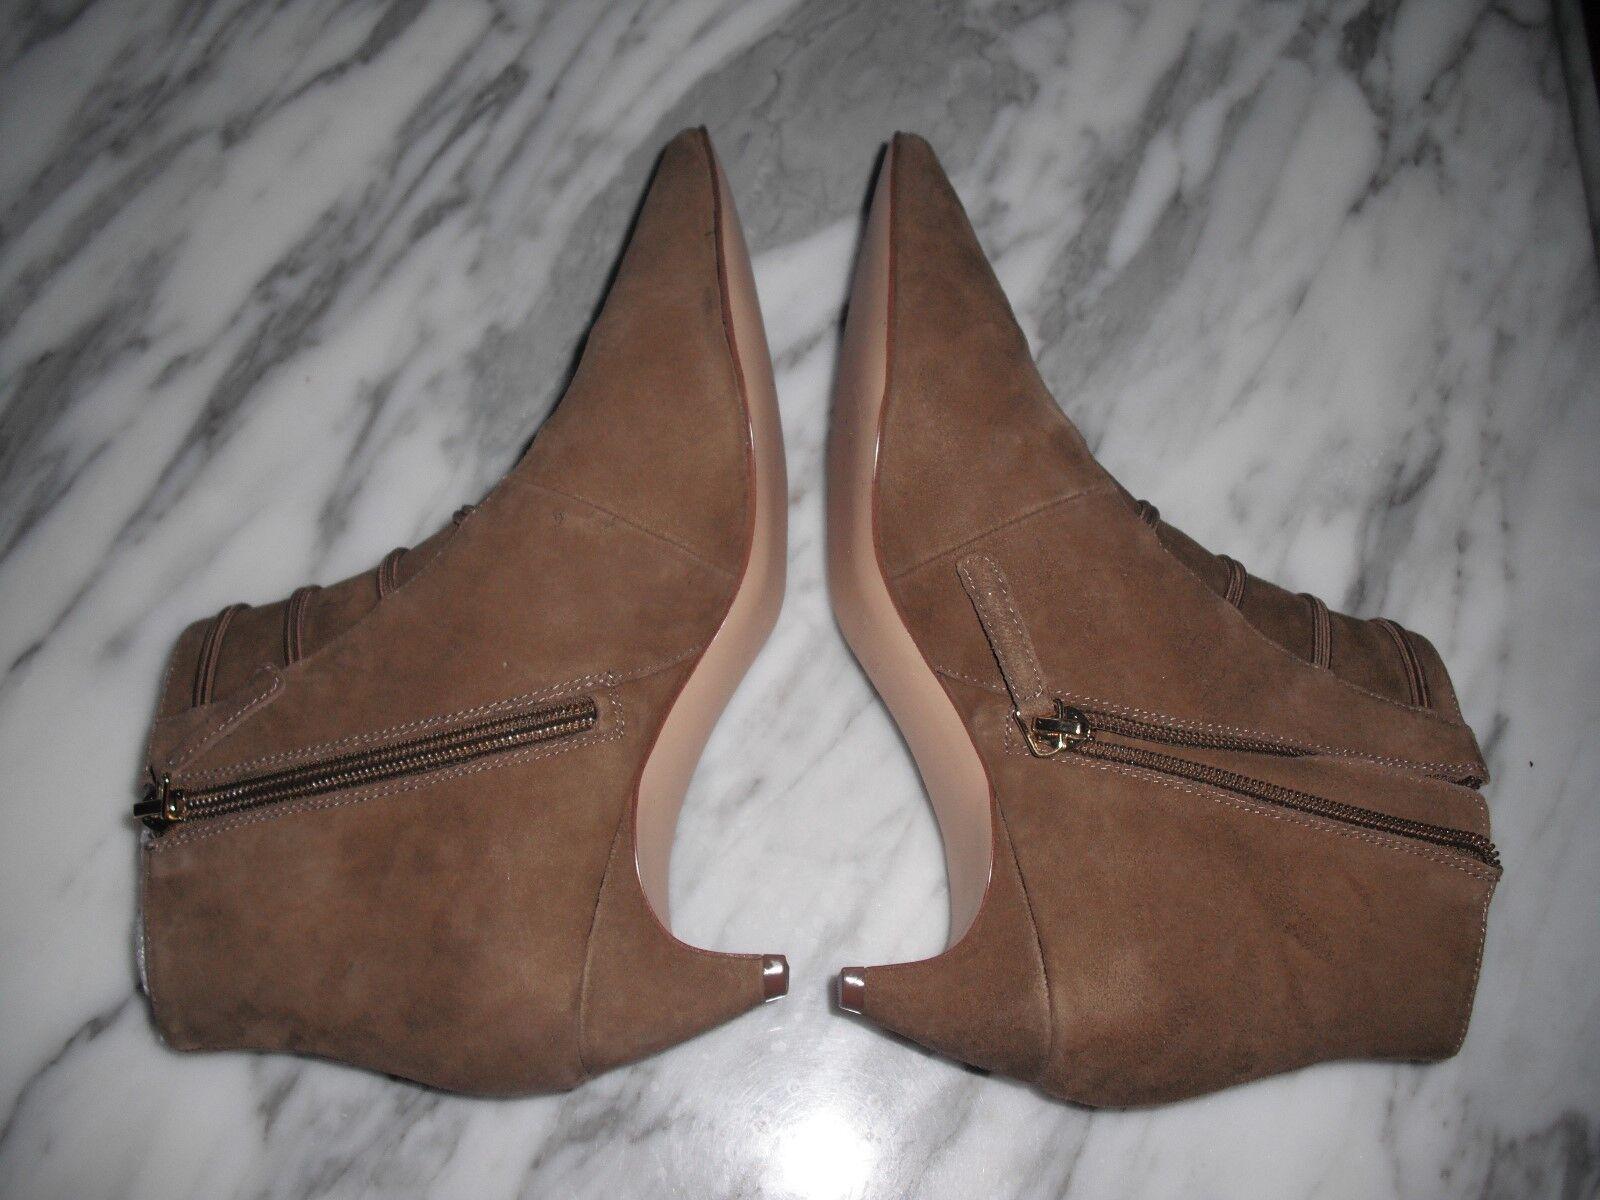 Nine west women point toe booties ZADAN brown suede size 6.5M new